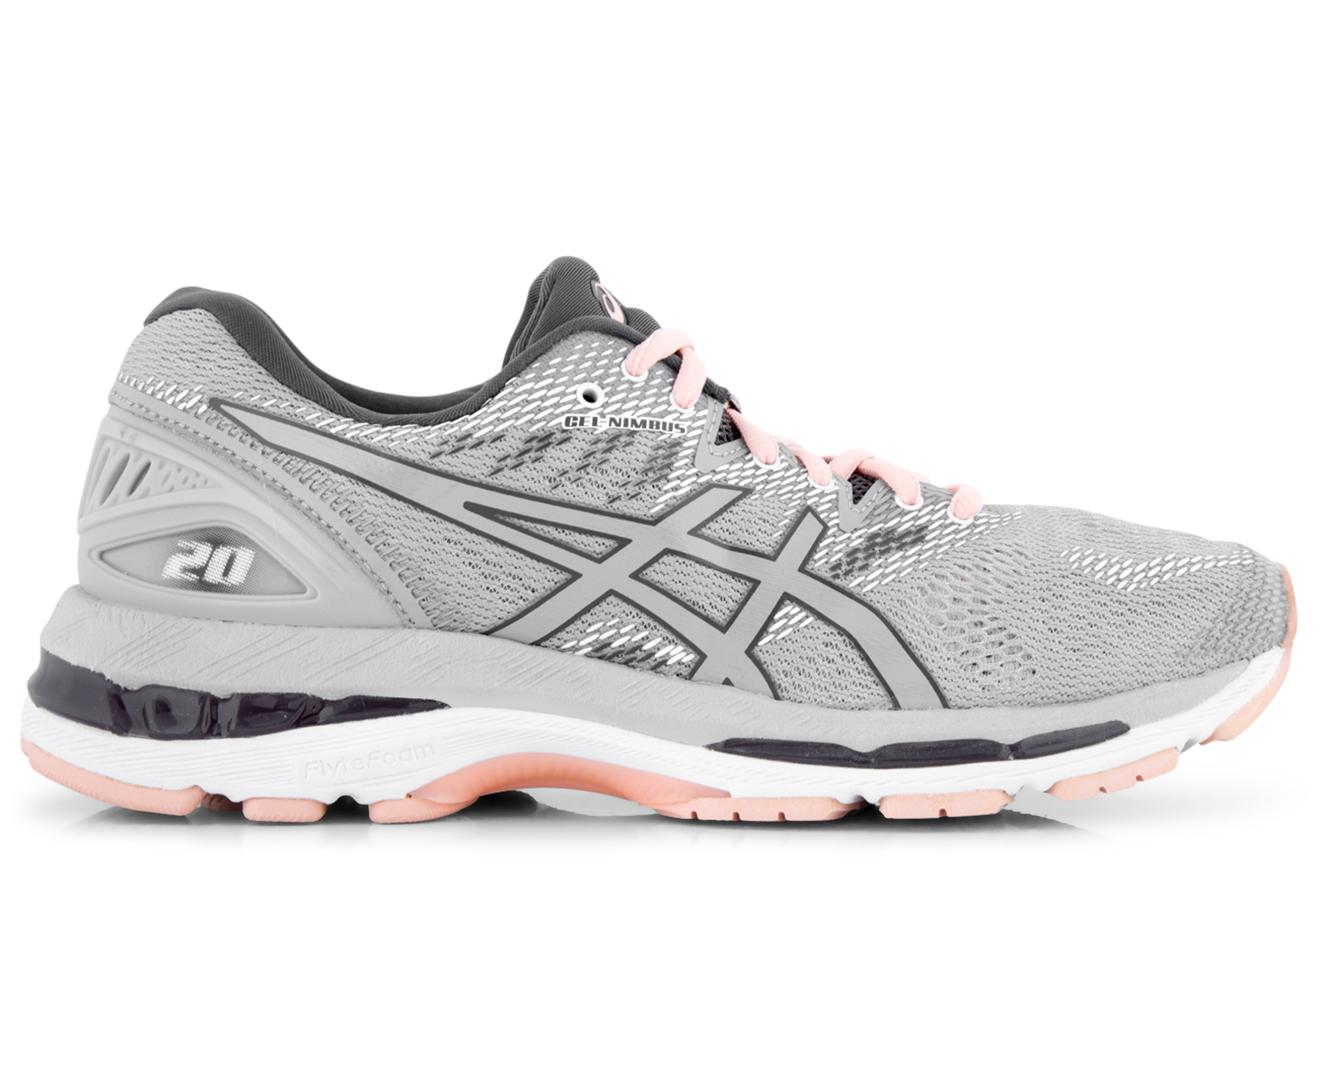 Nimbus Gel Asics About Greyseashell Pink Women's Details Shoe Mid 20 SGzUVqpM